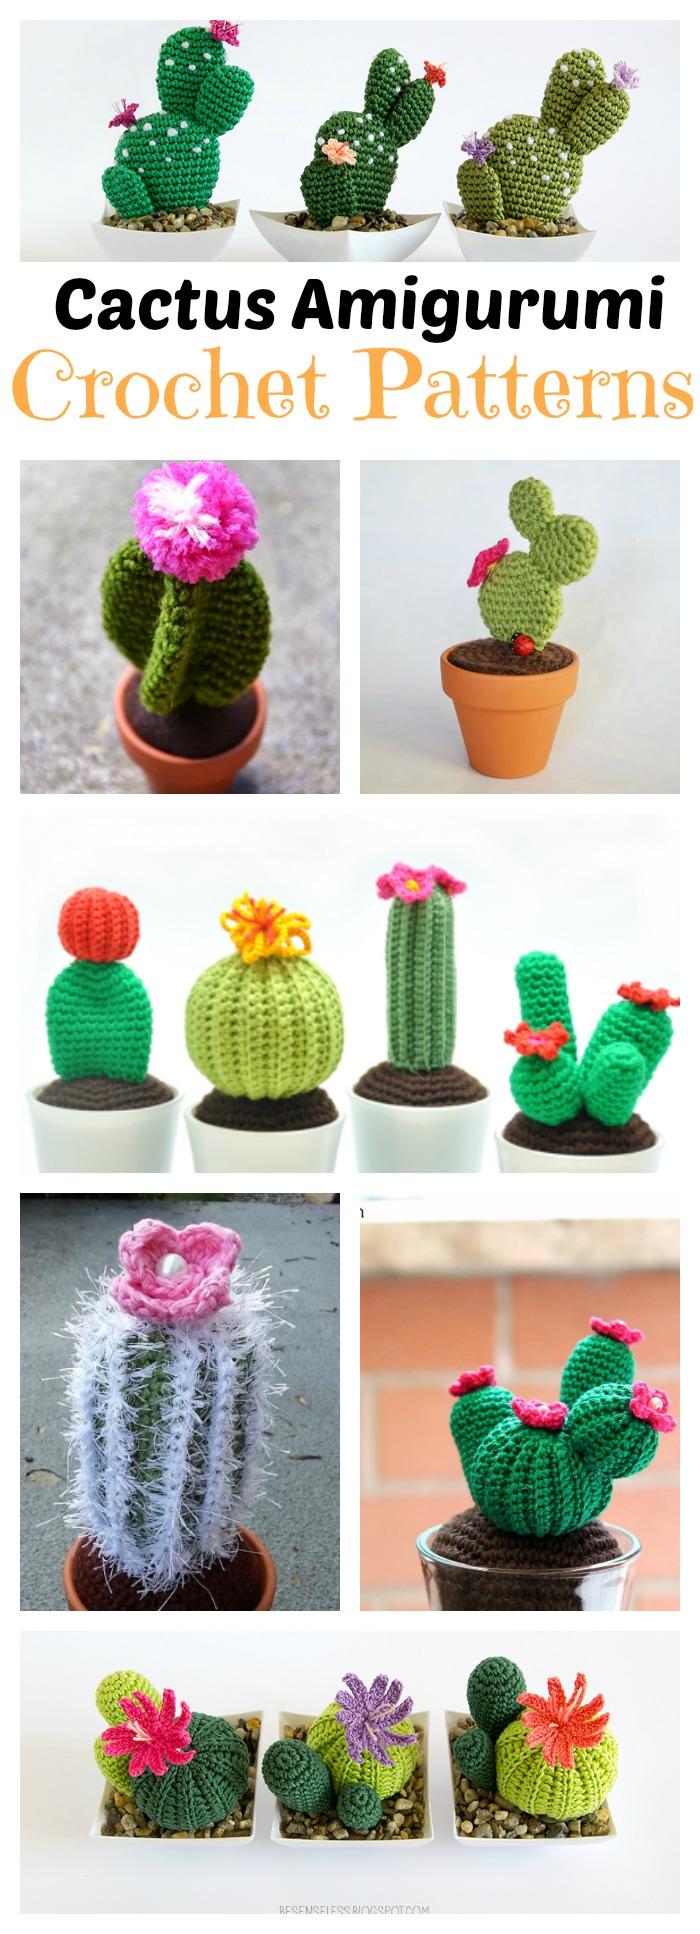 10+ Desert Cactus Amigurumi Crochet Patterns